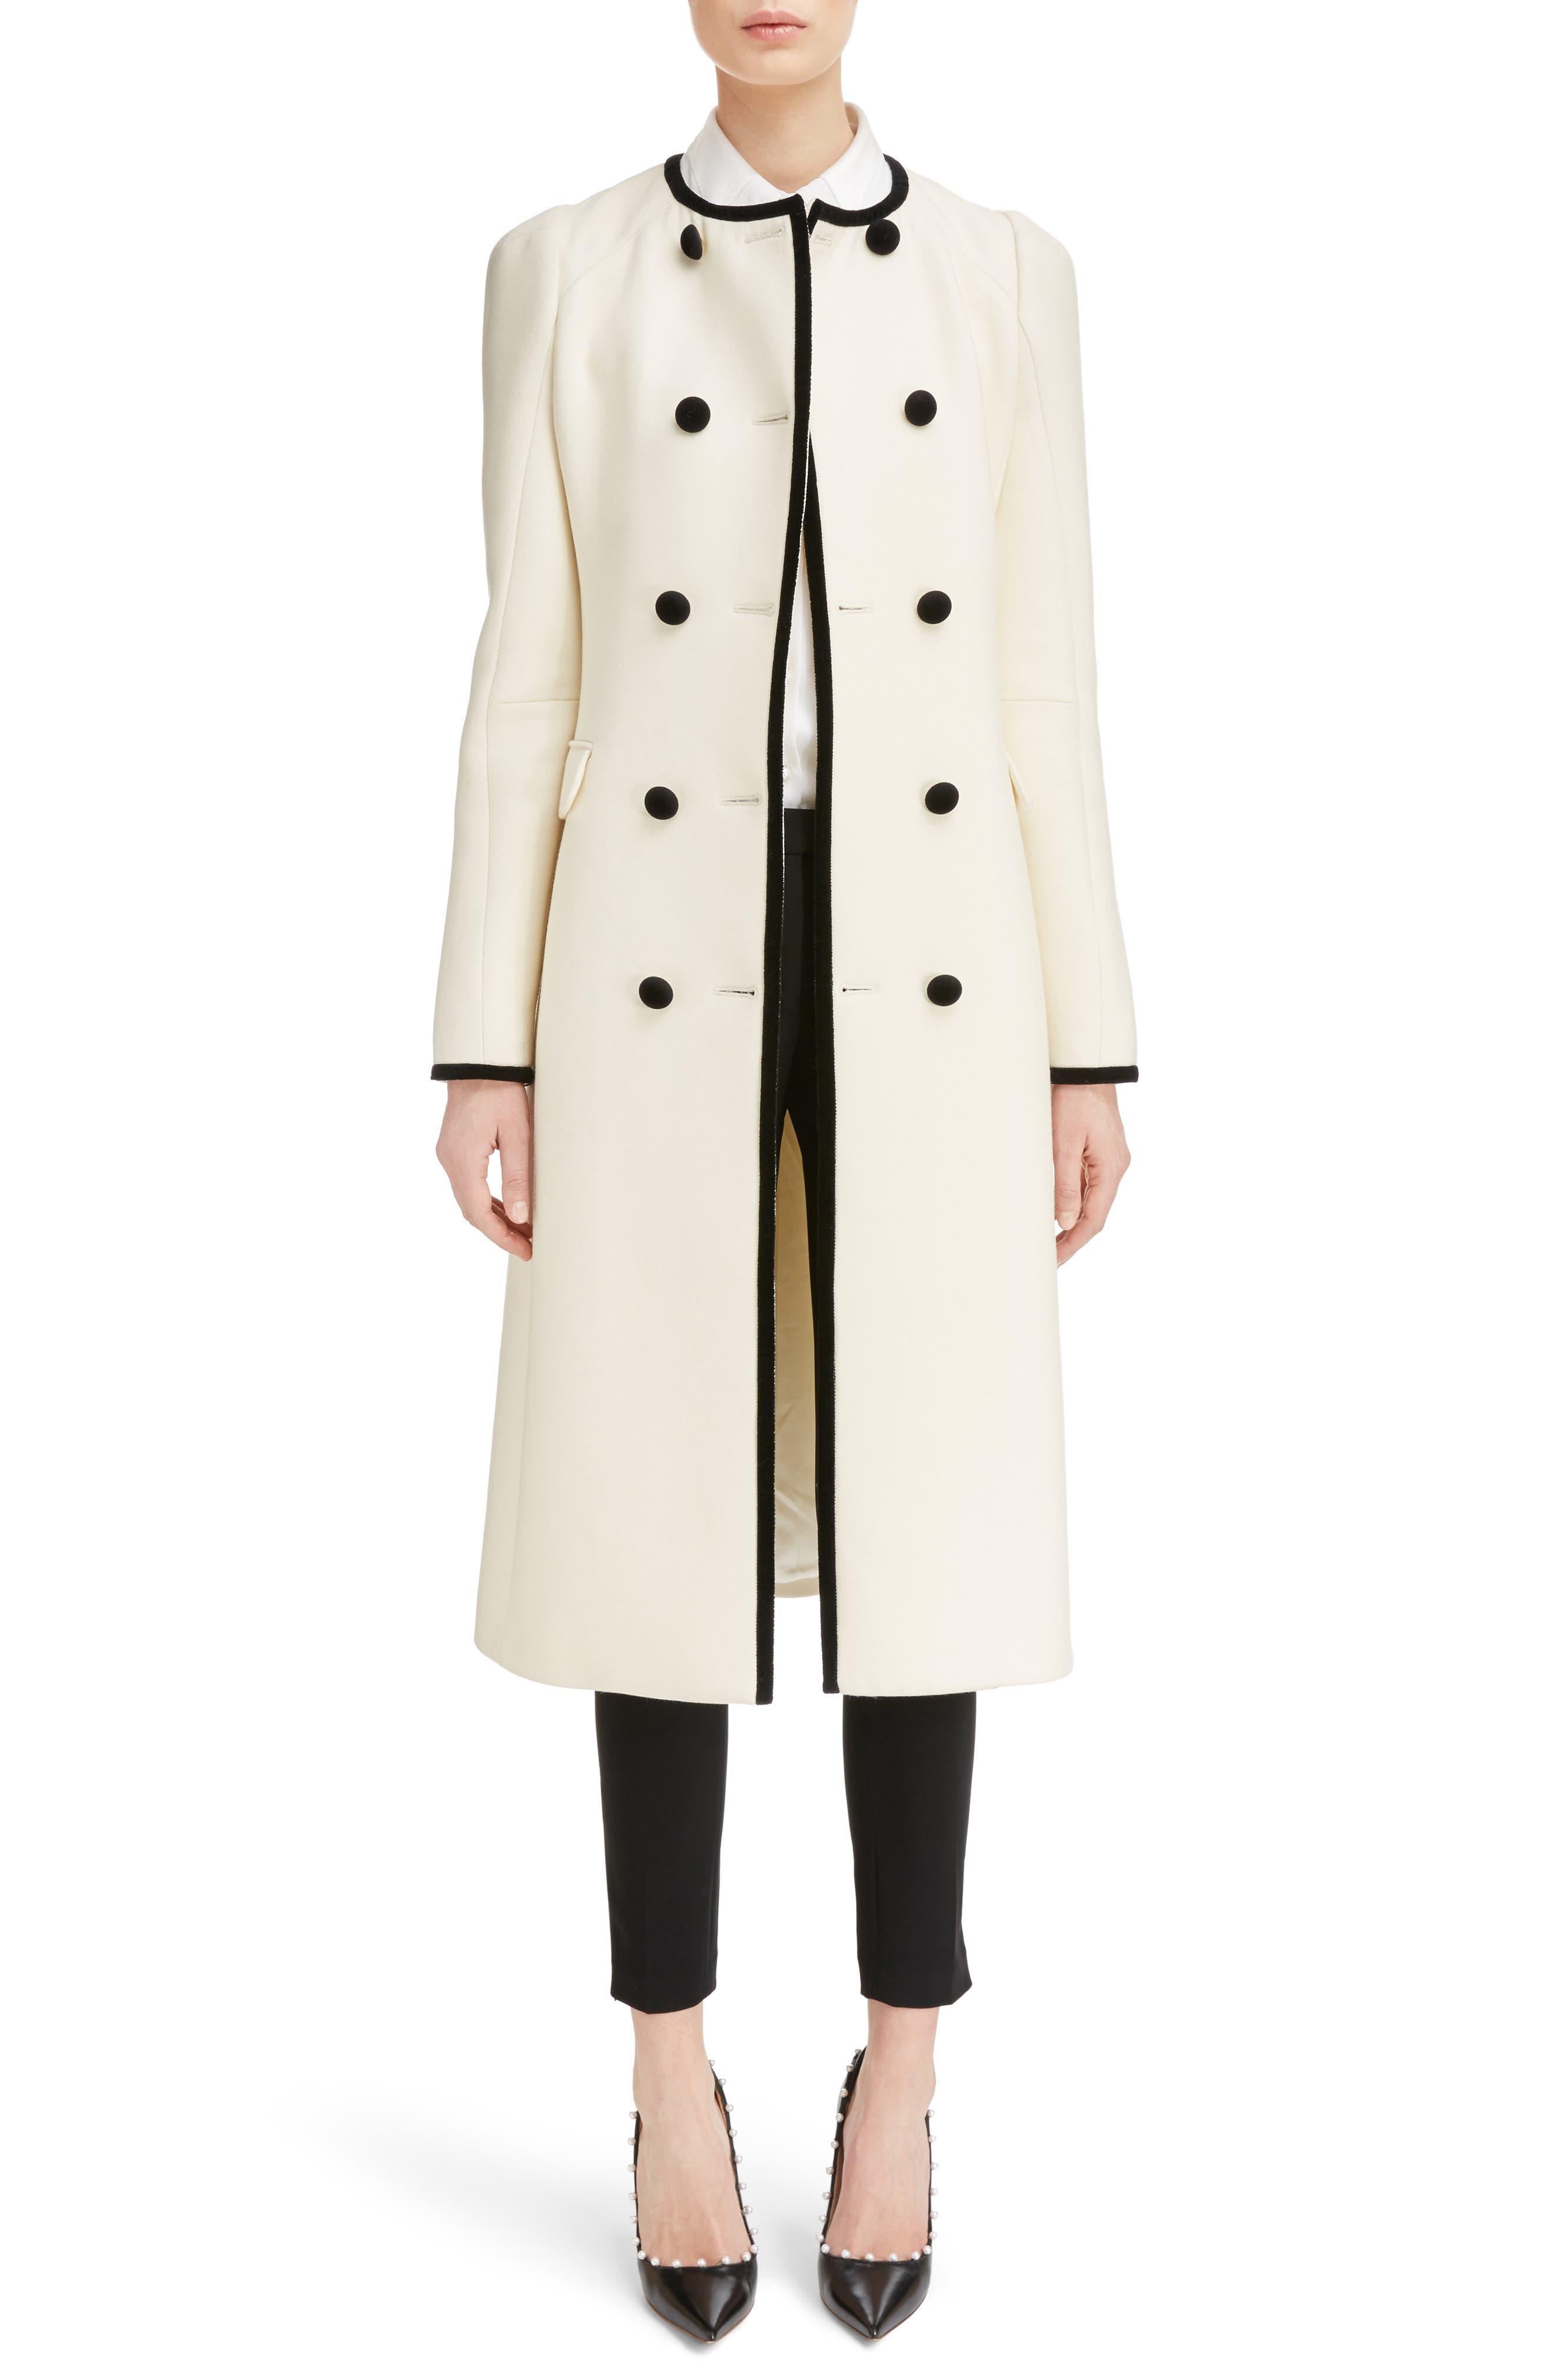 Alternate Image 1 Selected - Altuzarra Bellasio Double Breasted Wool Coat